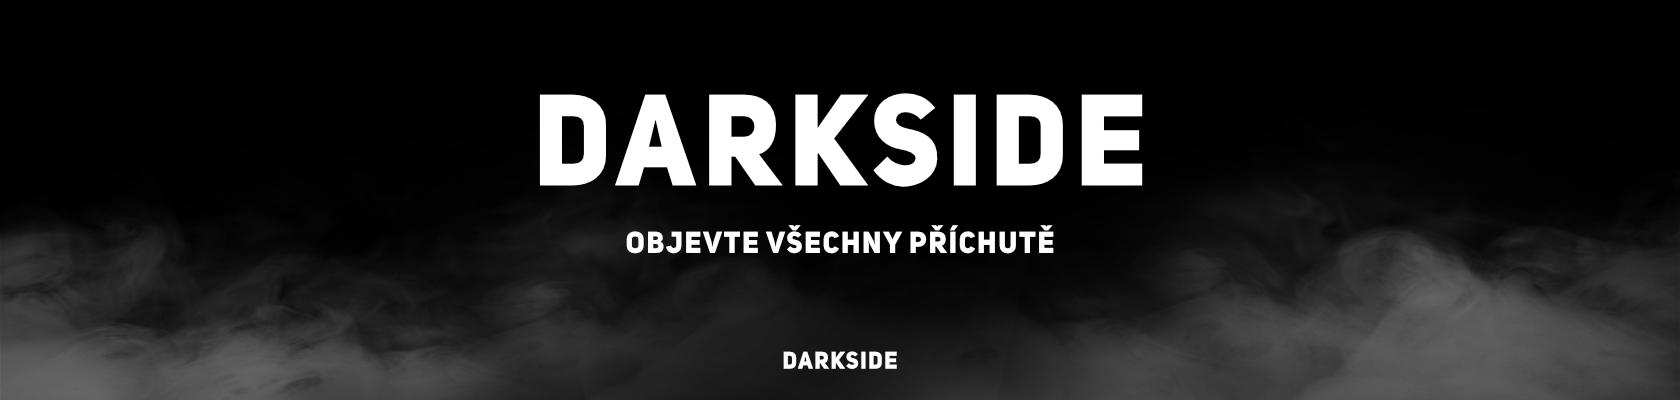 Darkside v prodeji